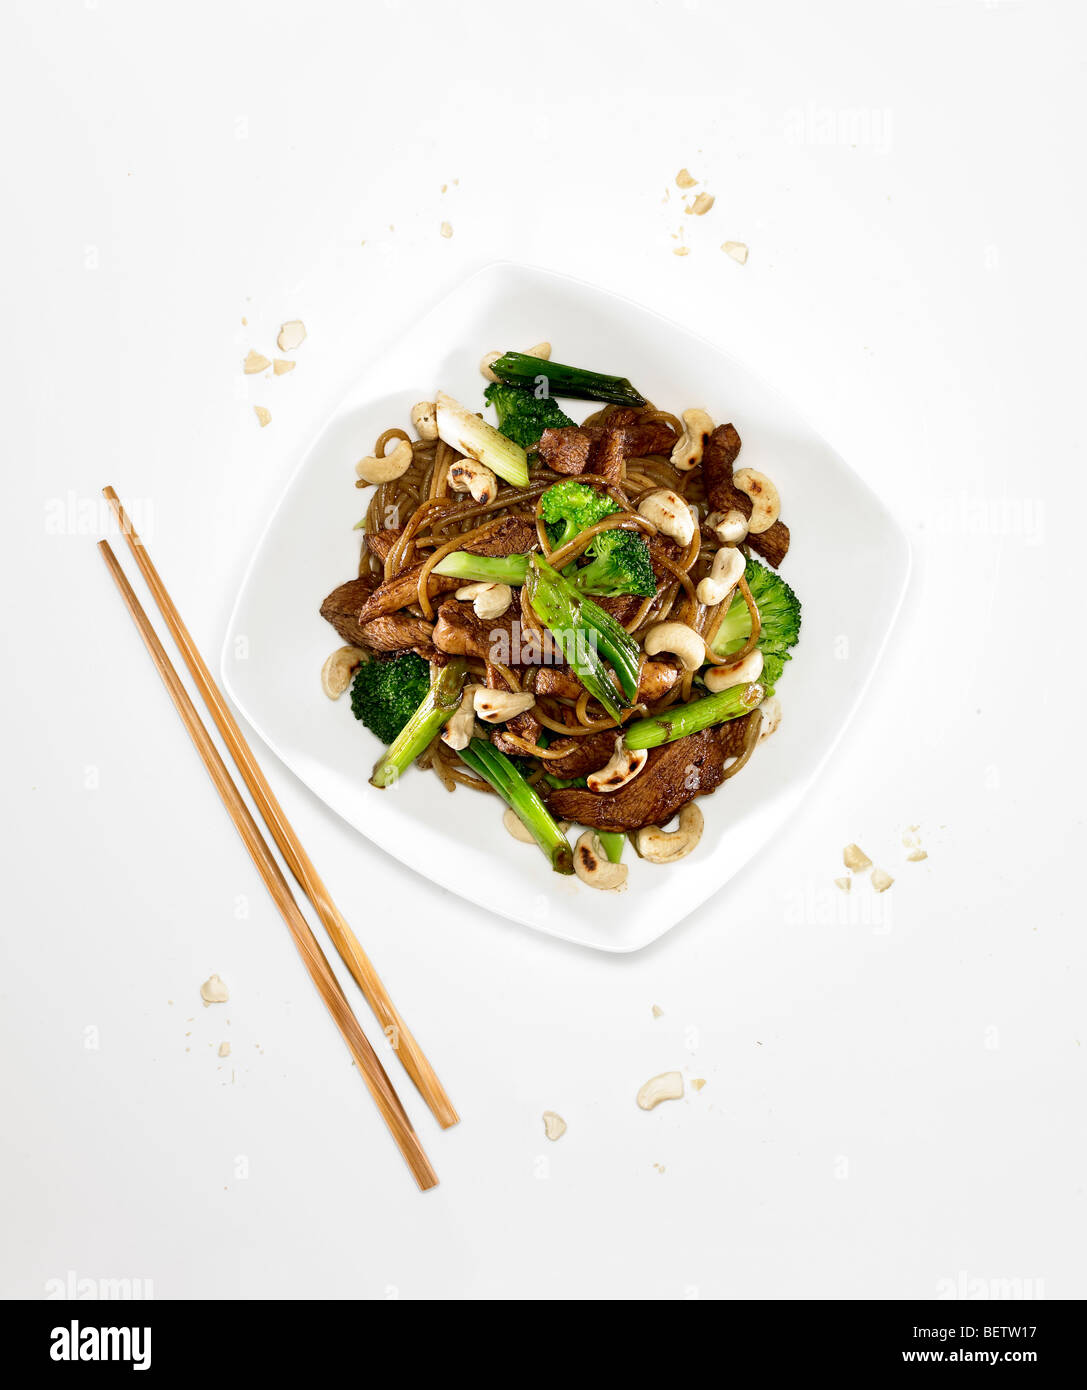 Chicken cashew stir fry, marinated in tamarind paste, soy sauce, garlic and lemon. - Stock Image